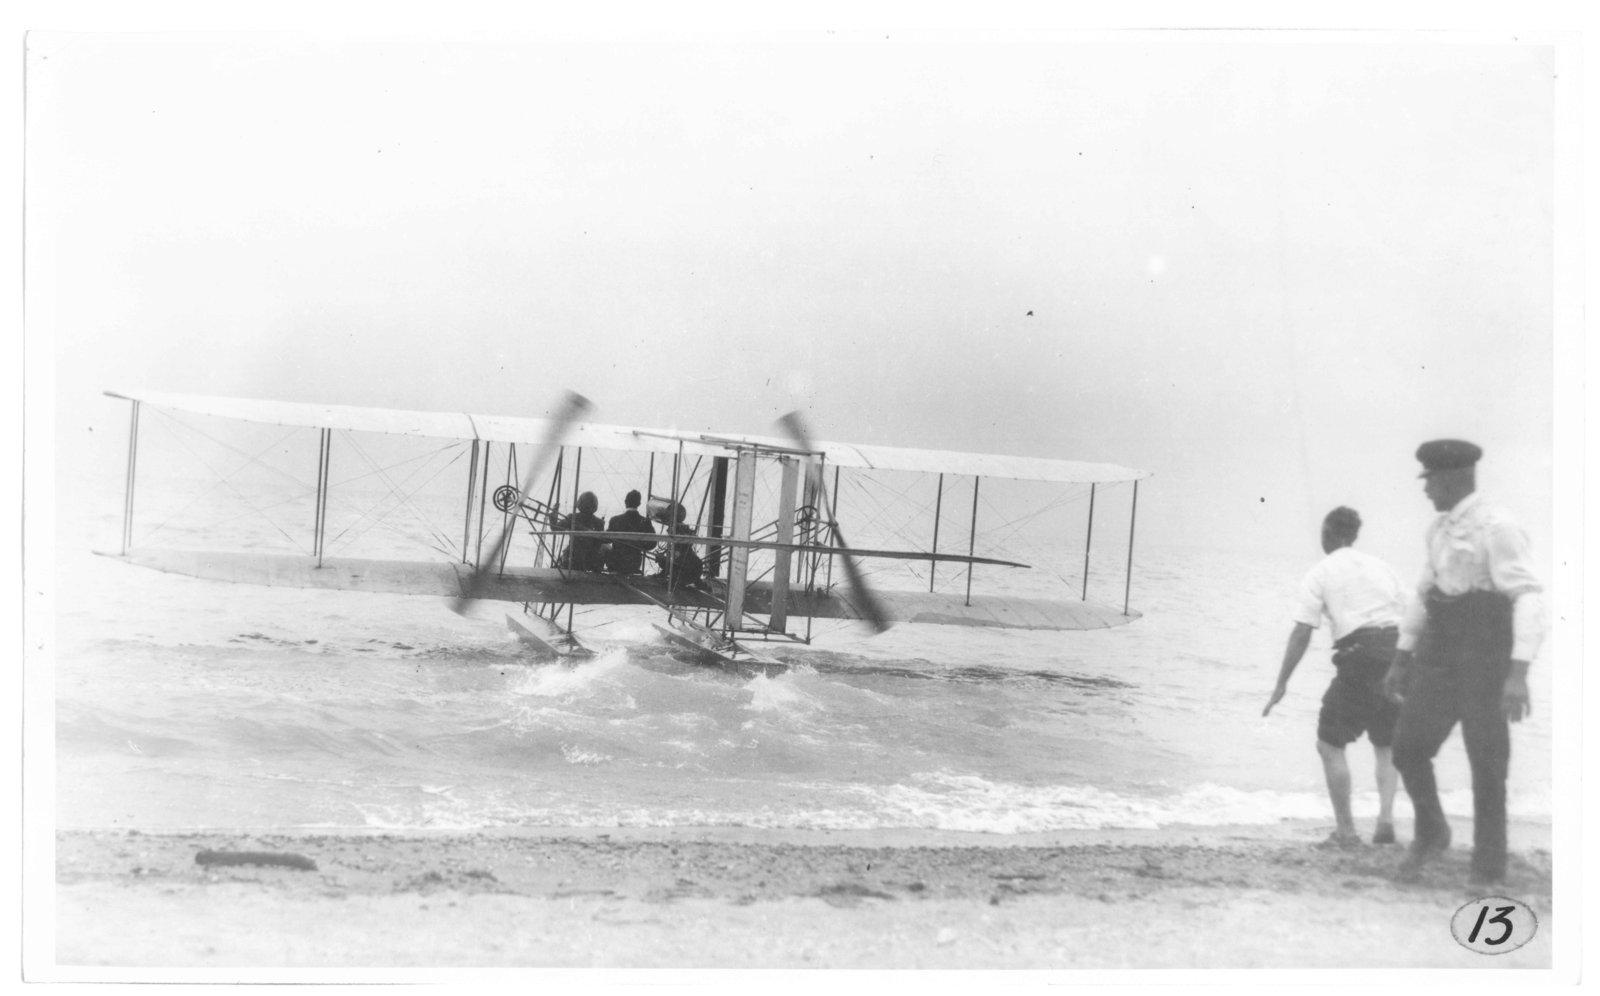 Miss Dora Labatt's flight with pilot Walter Brookins, July 20, 1912. <br>Courtesy the London Public Library.